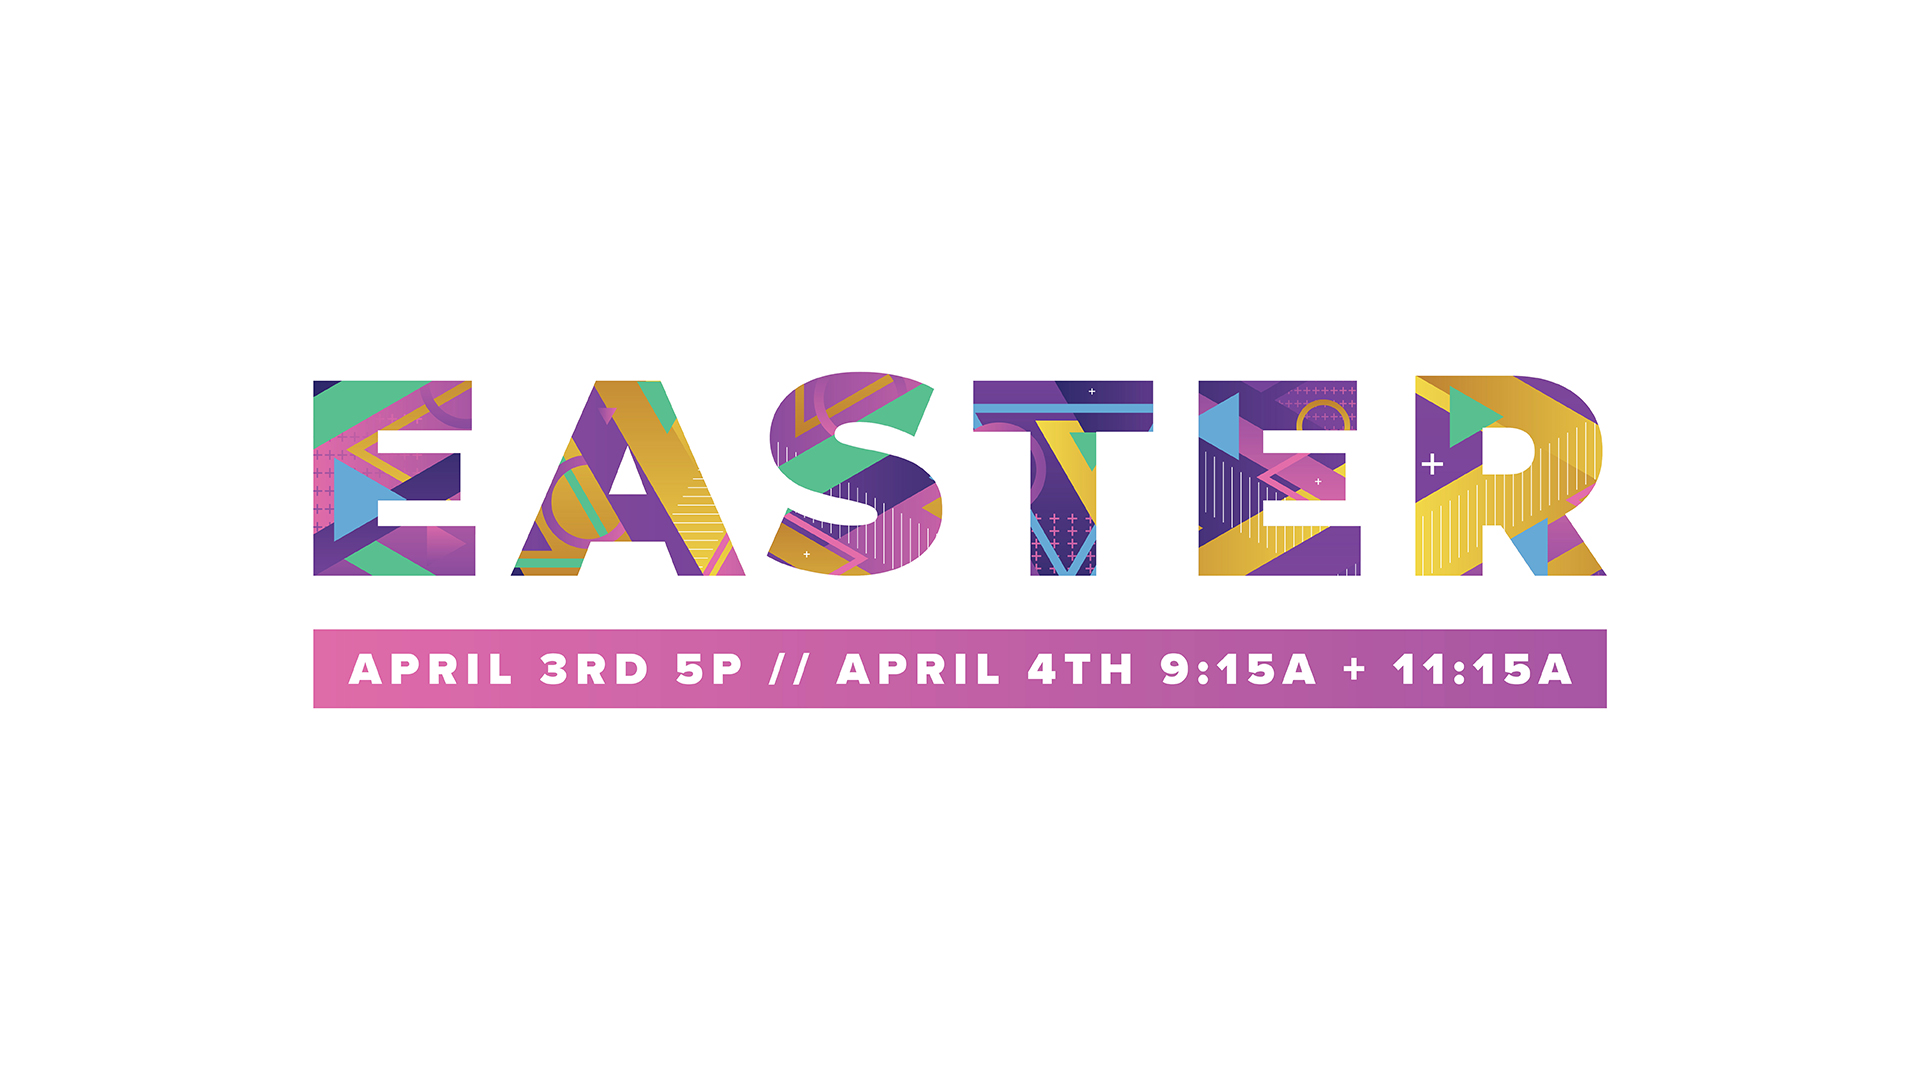 Series: Easter